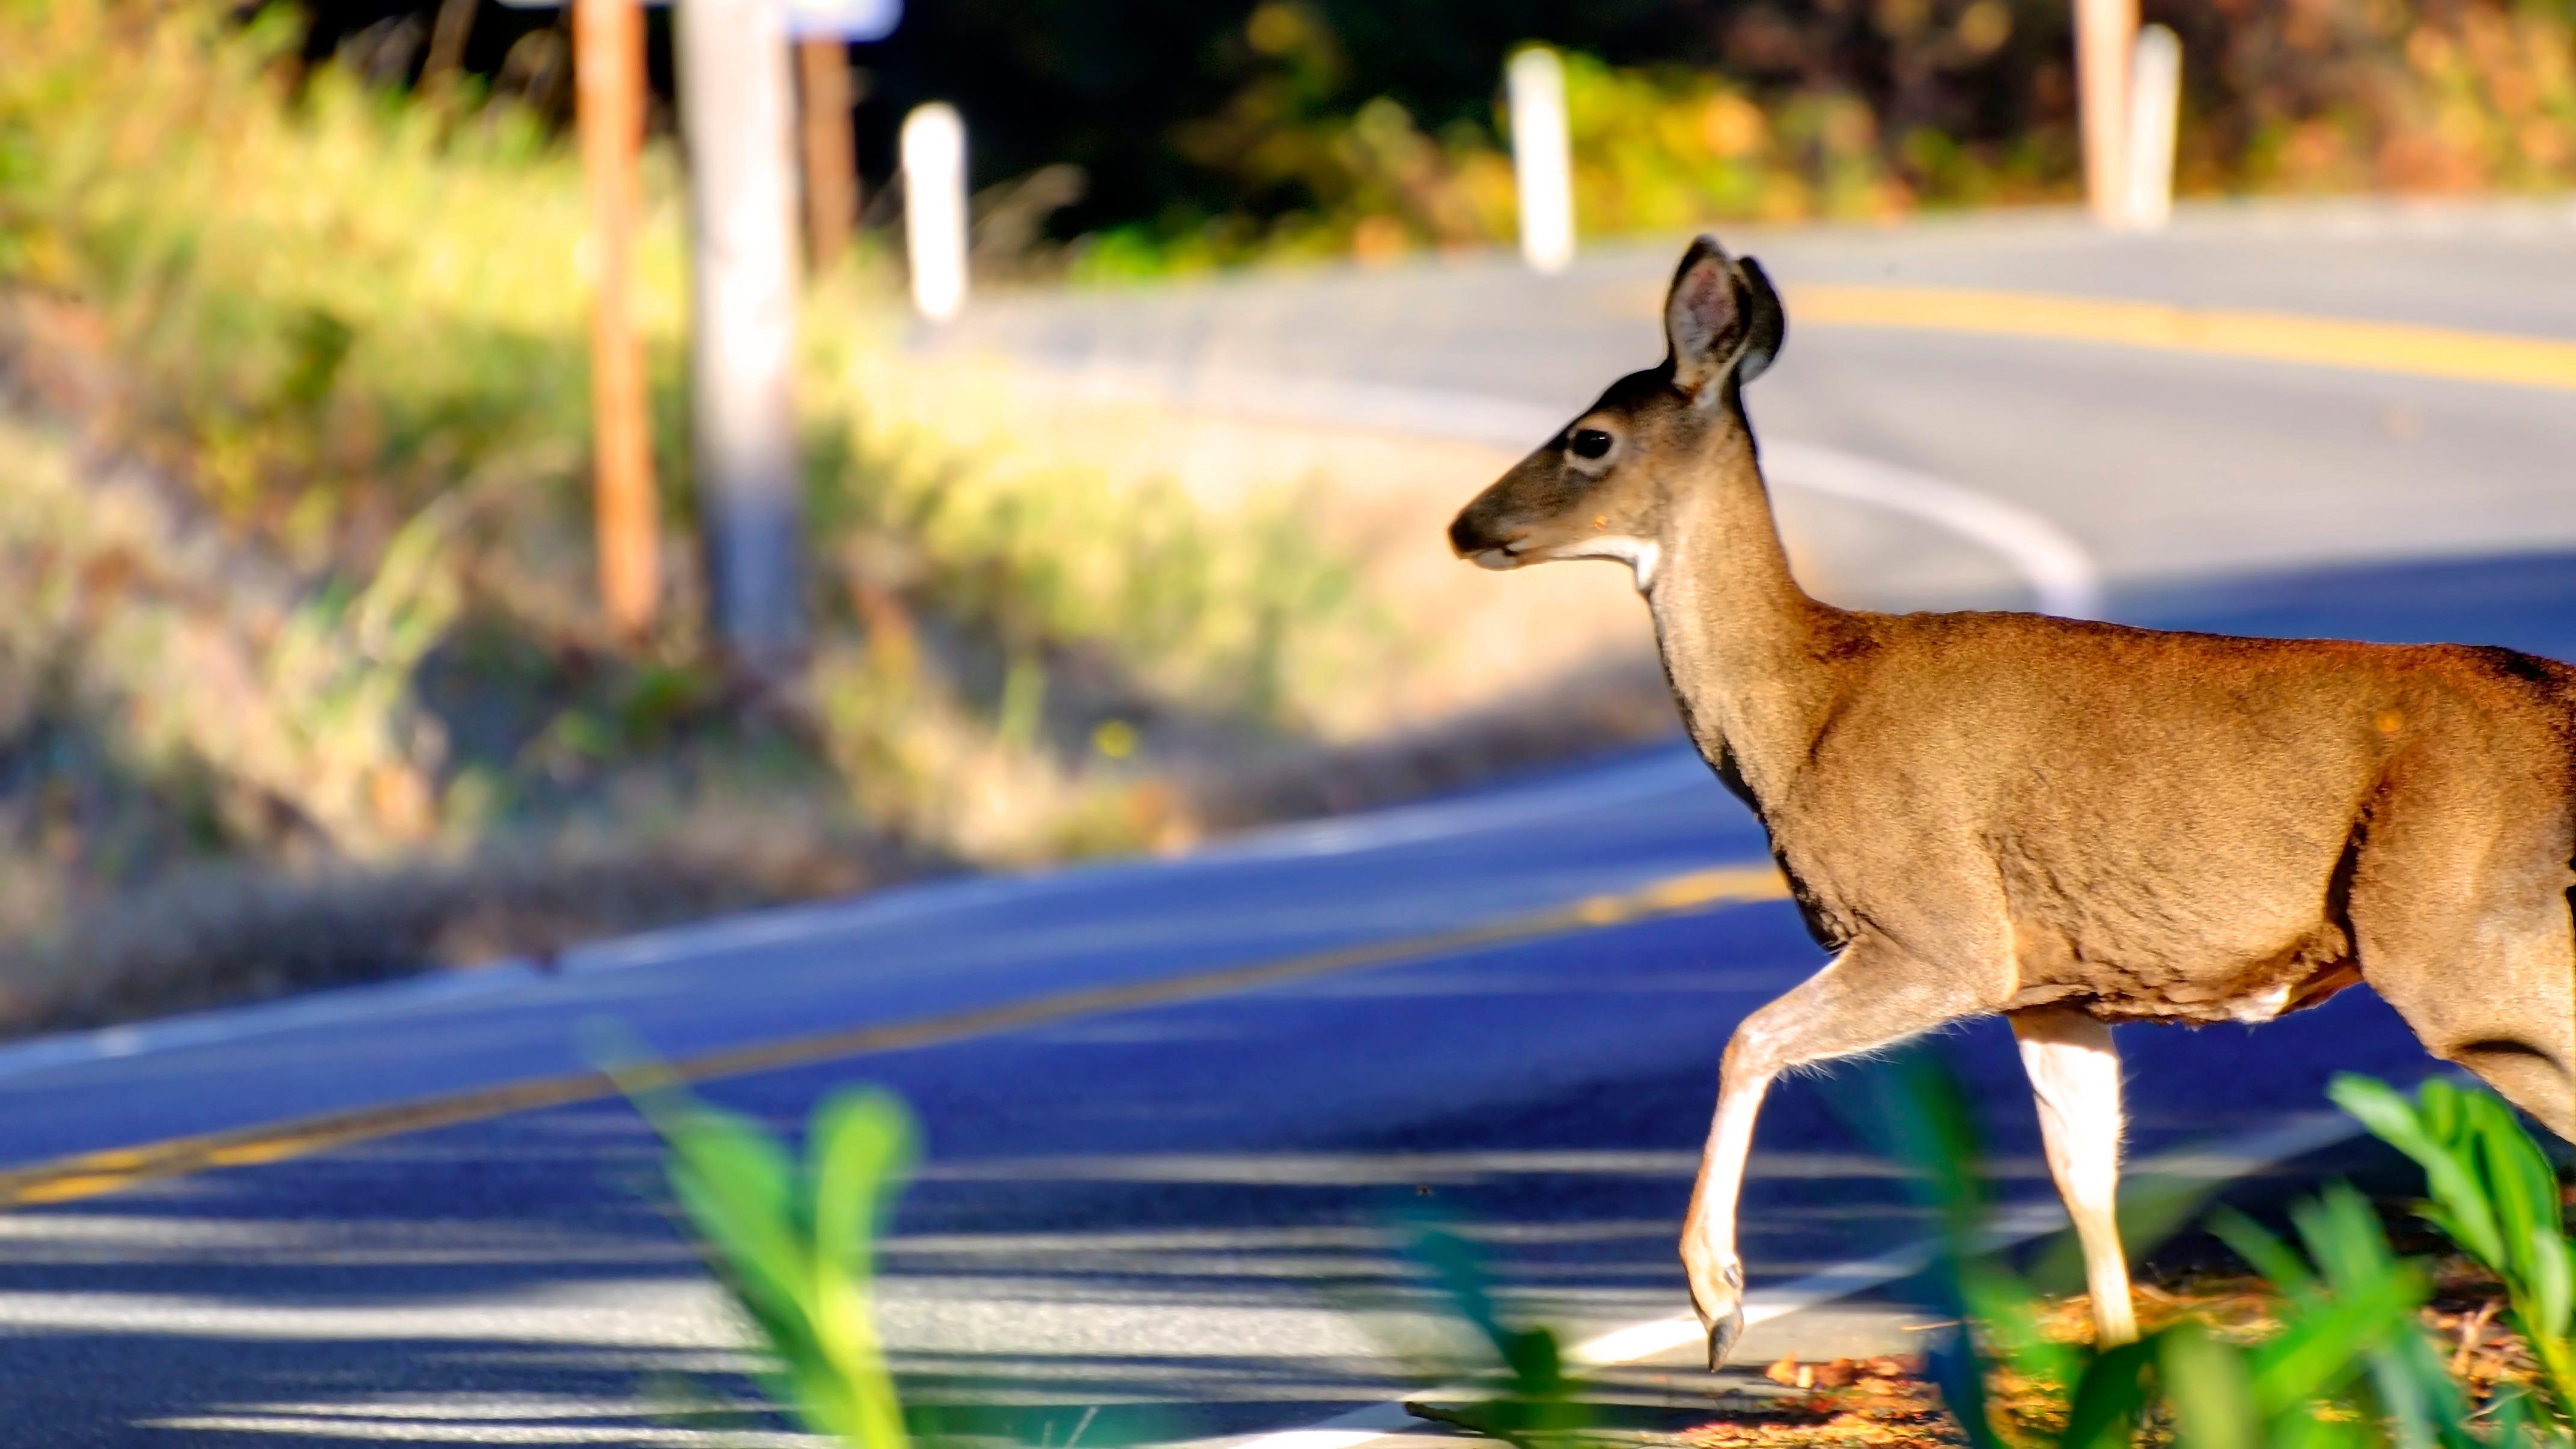 Deer, bear hunting permit deadlines approaching